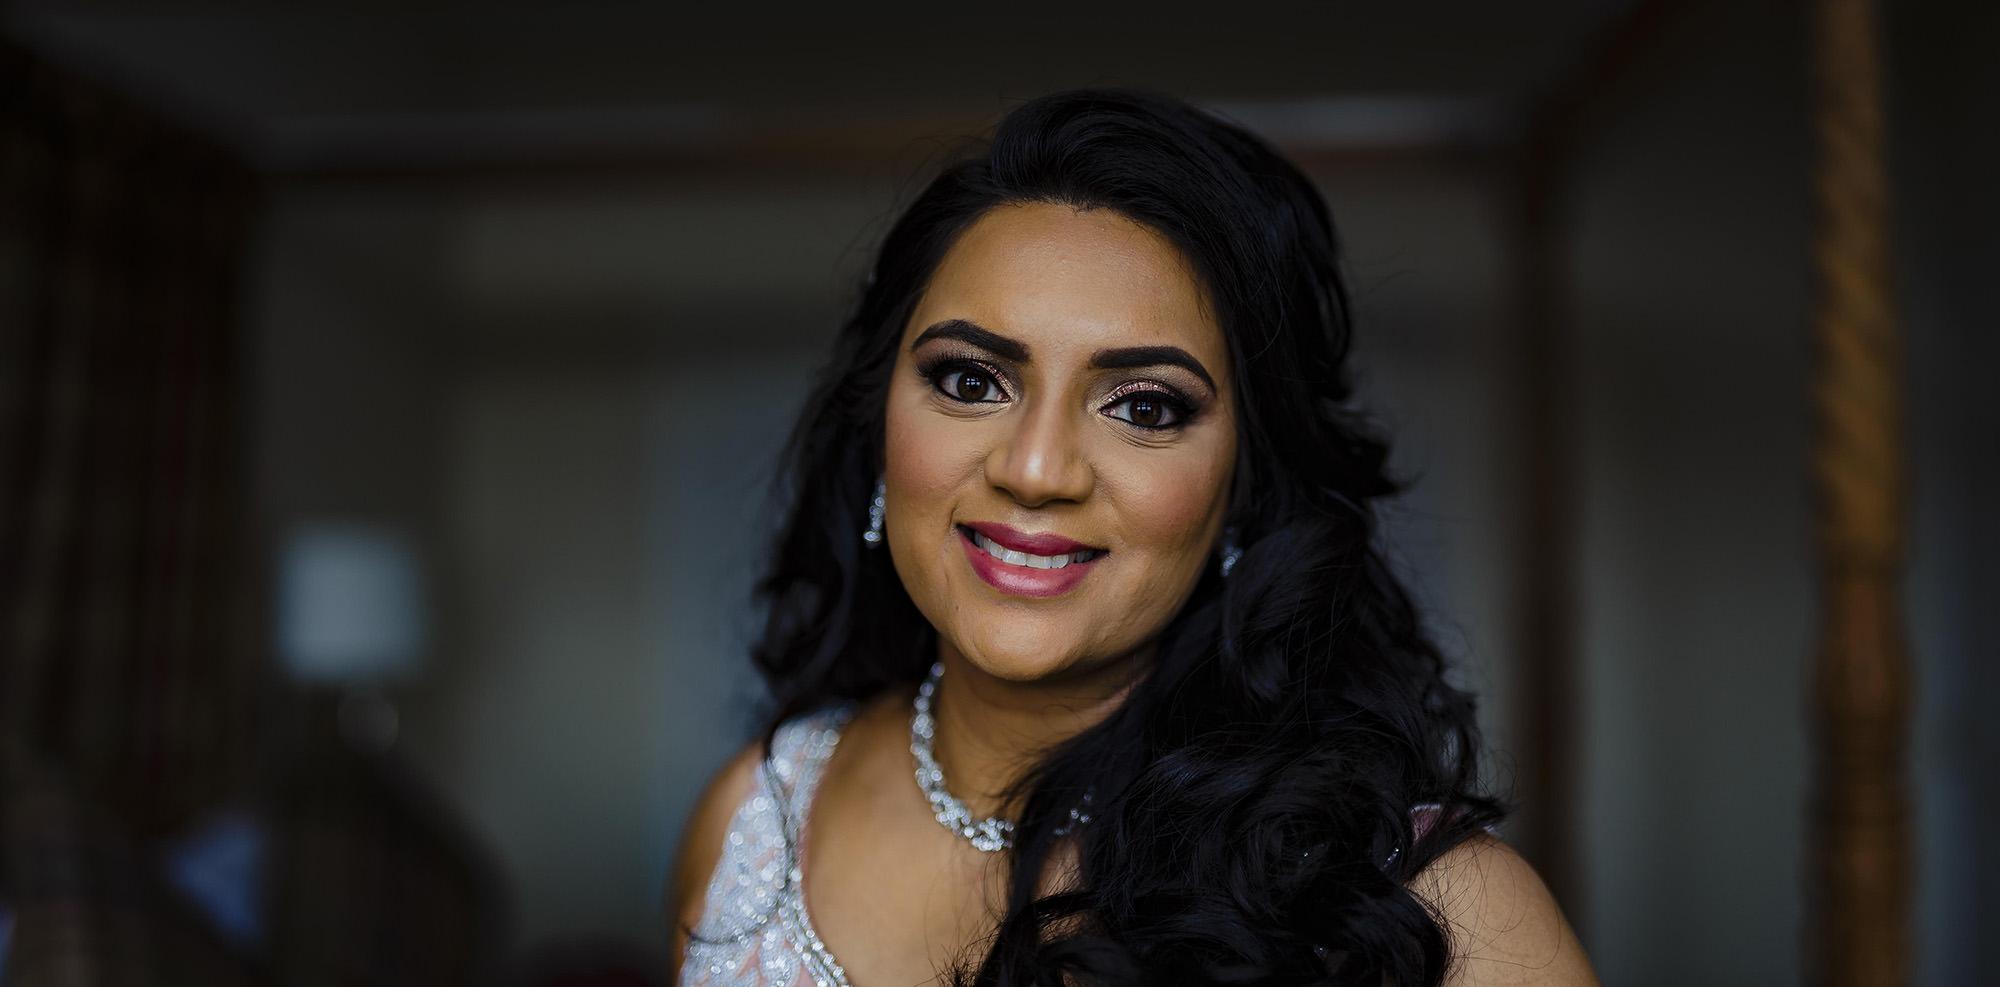 bridal portrait in her wedding dress at froyle park